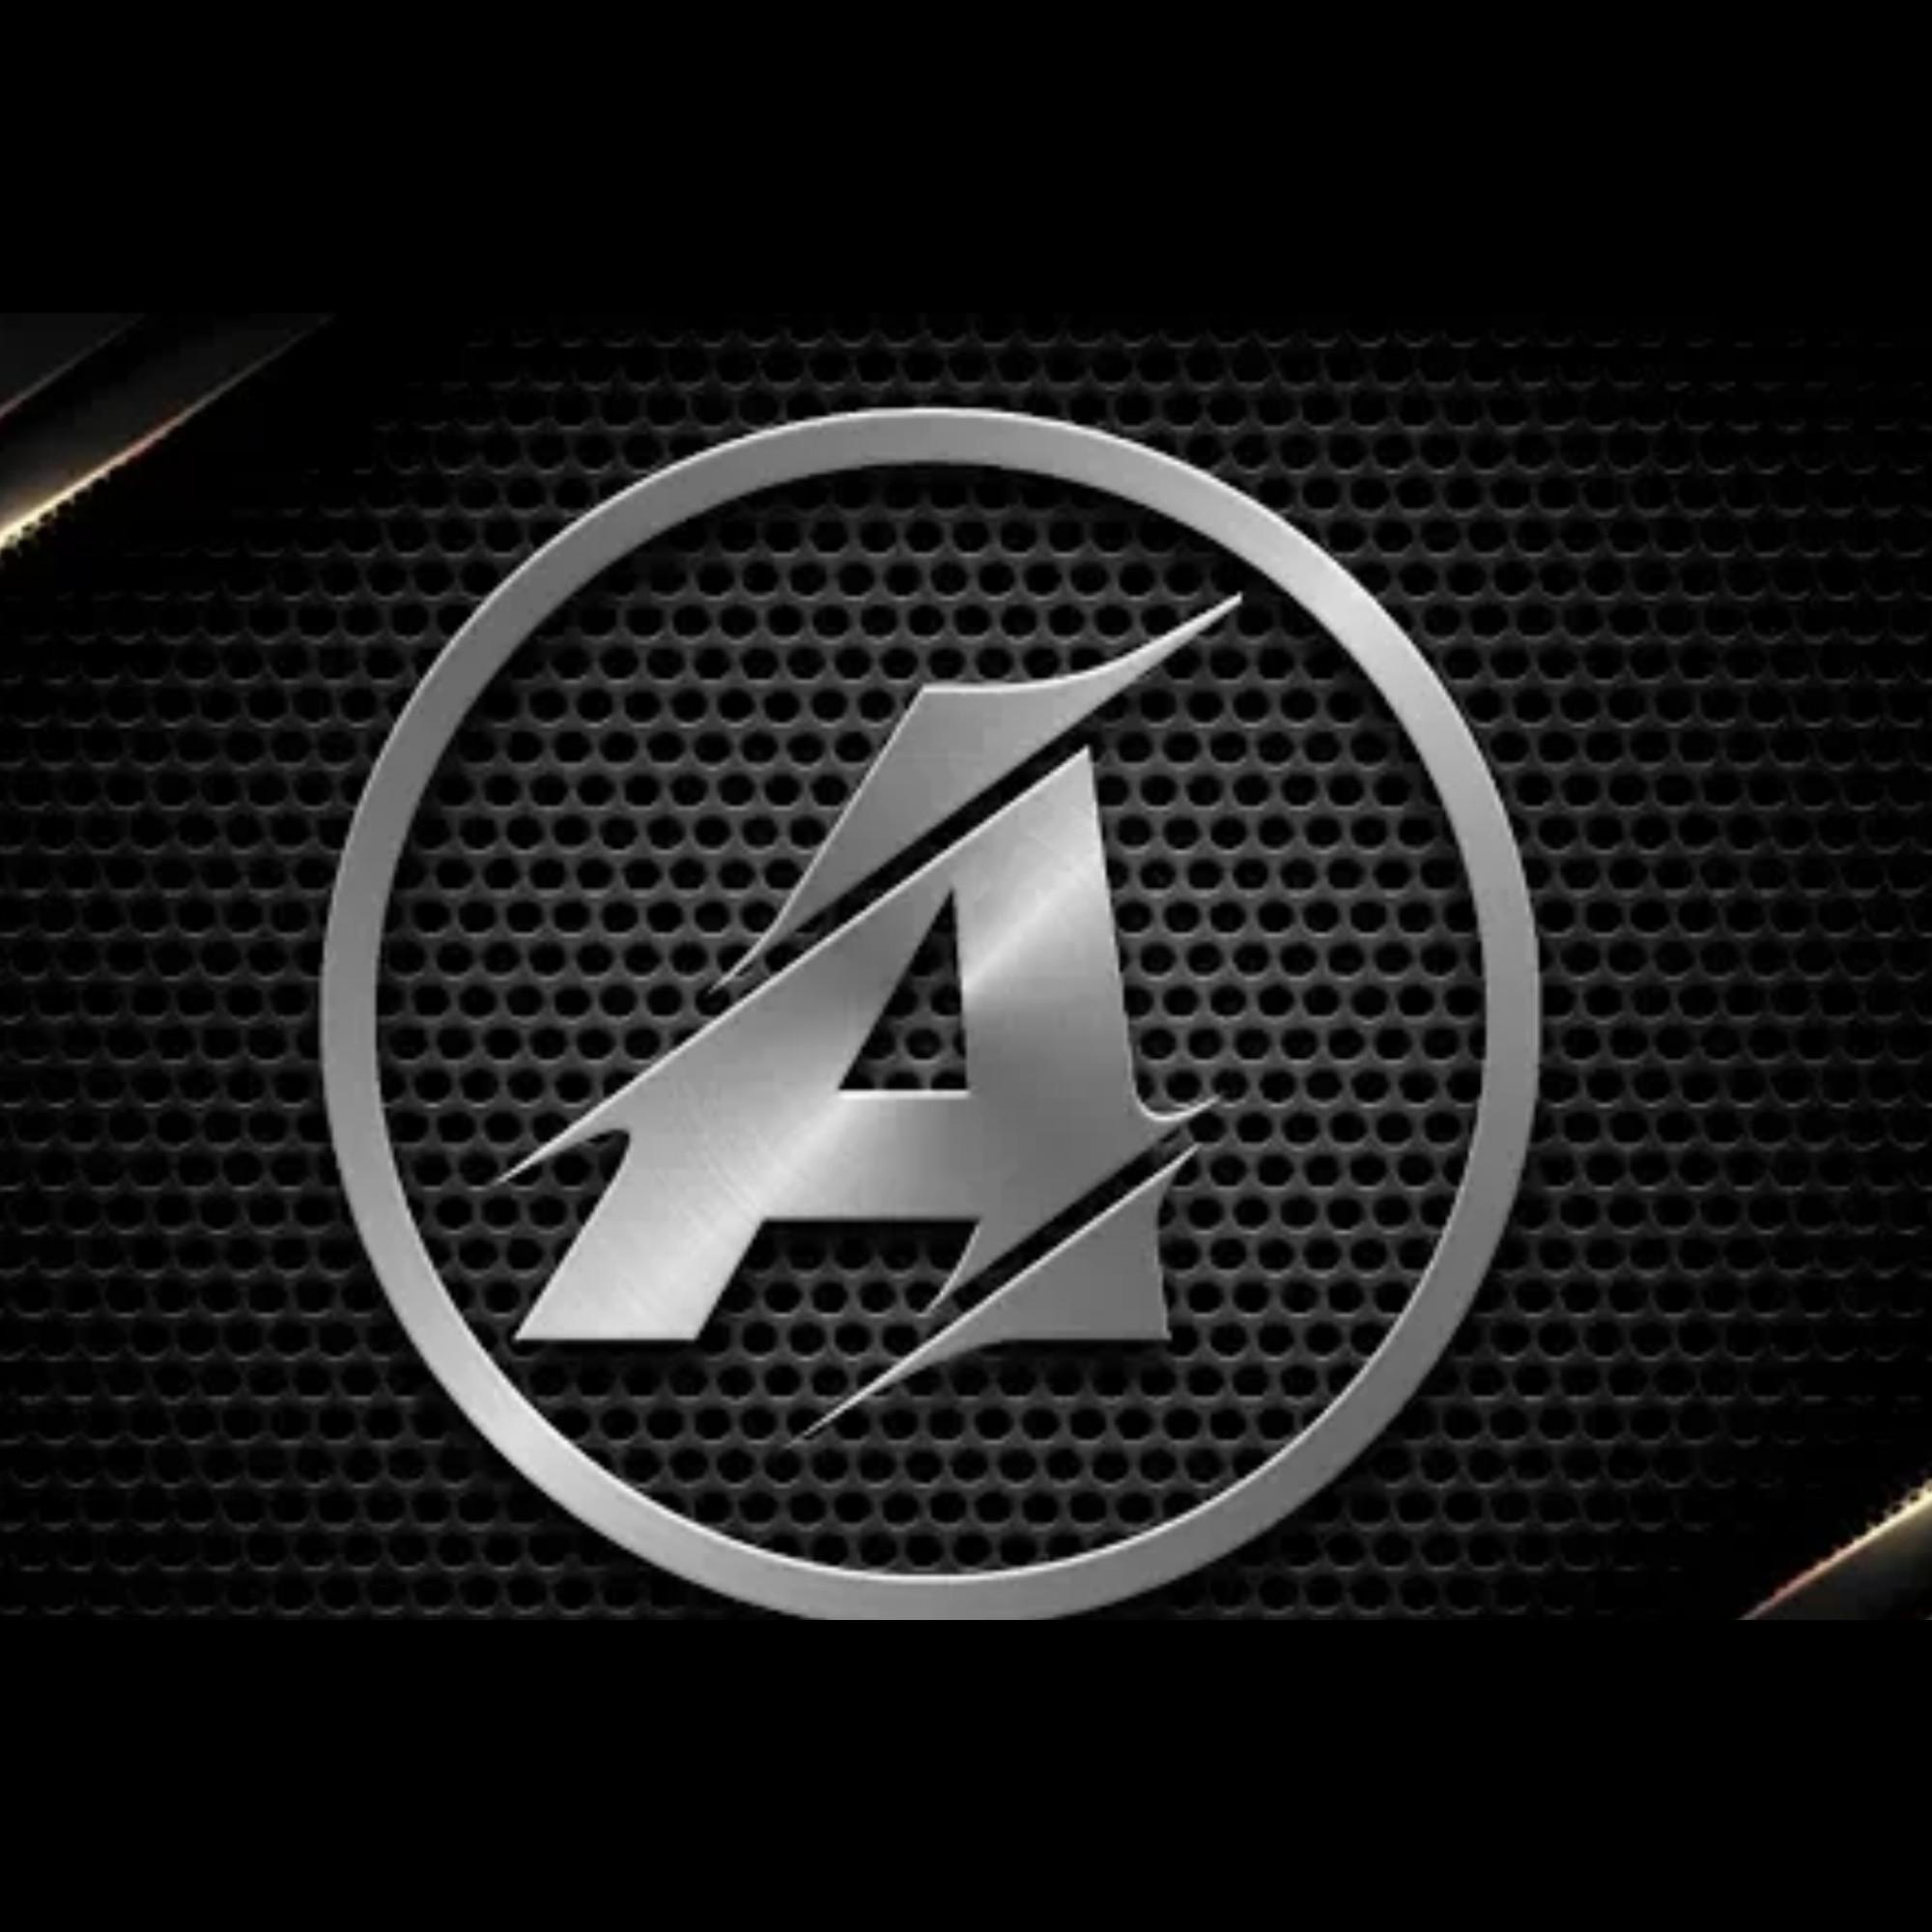 Professional logo design, YouTube logo making, website logo.